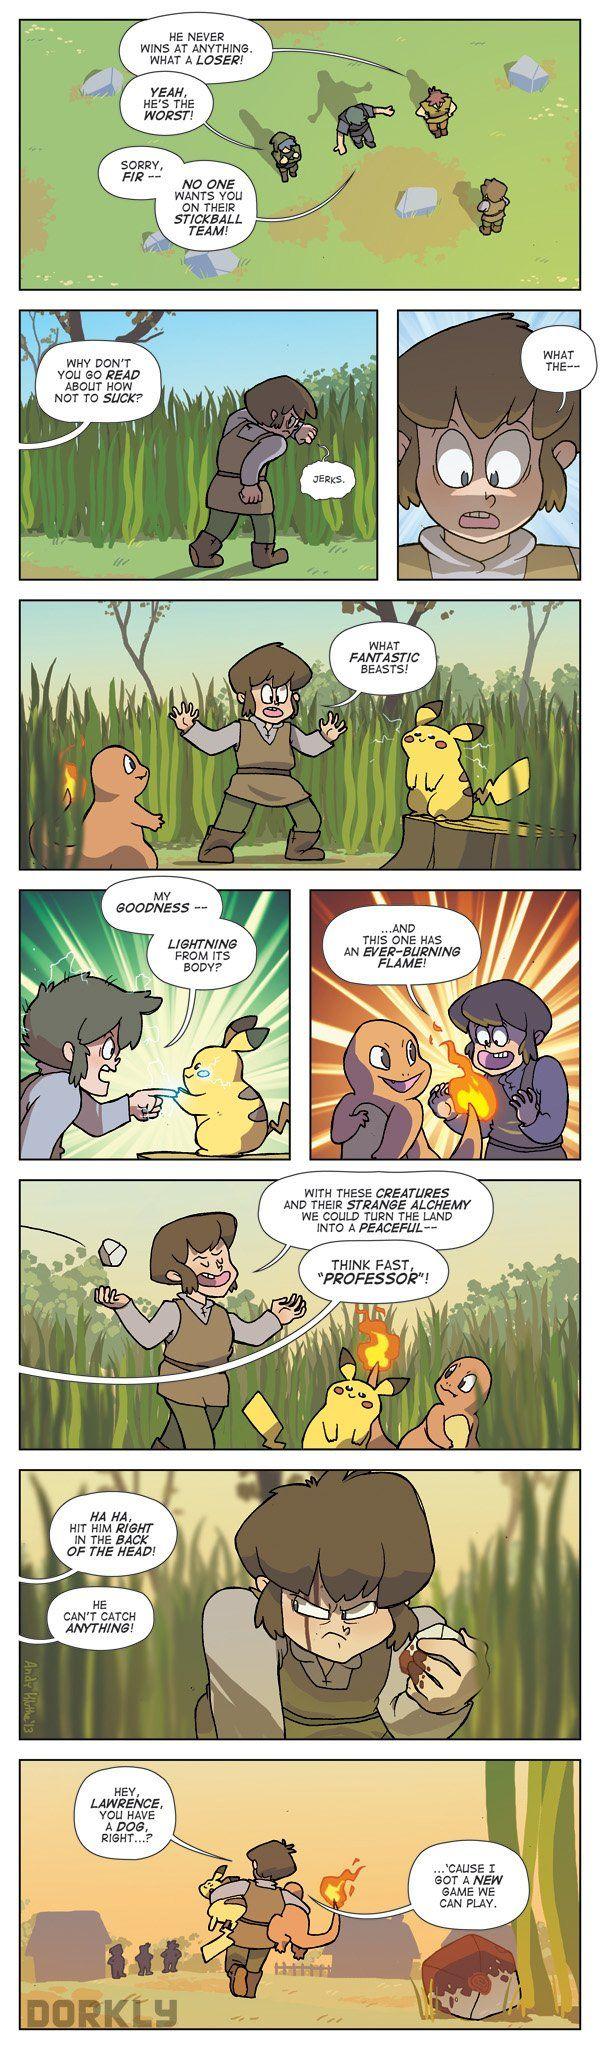 """The Discovery of Pokémon"" #dorkly #geek #pokemon"